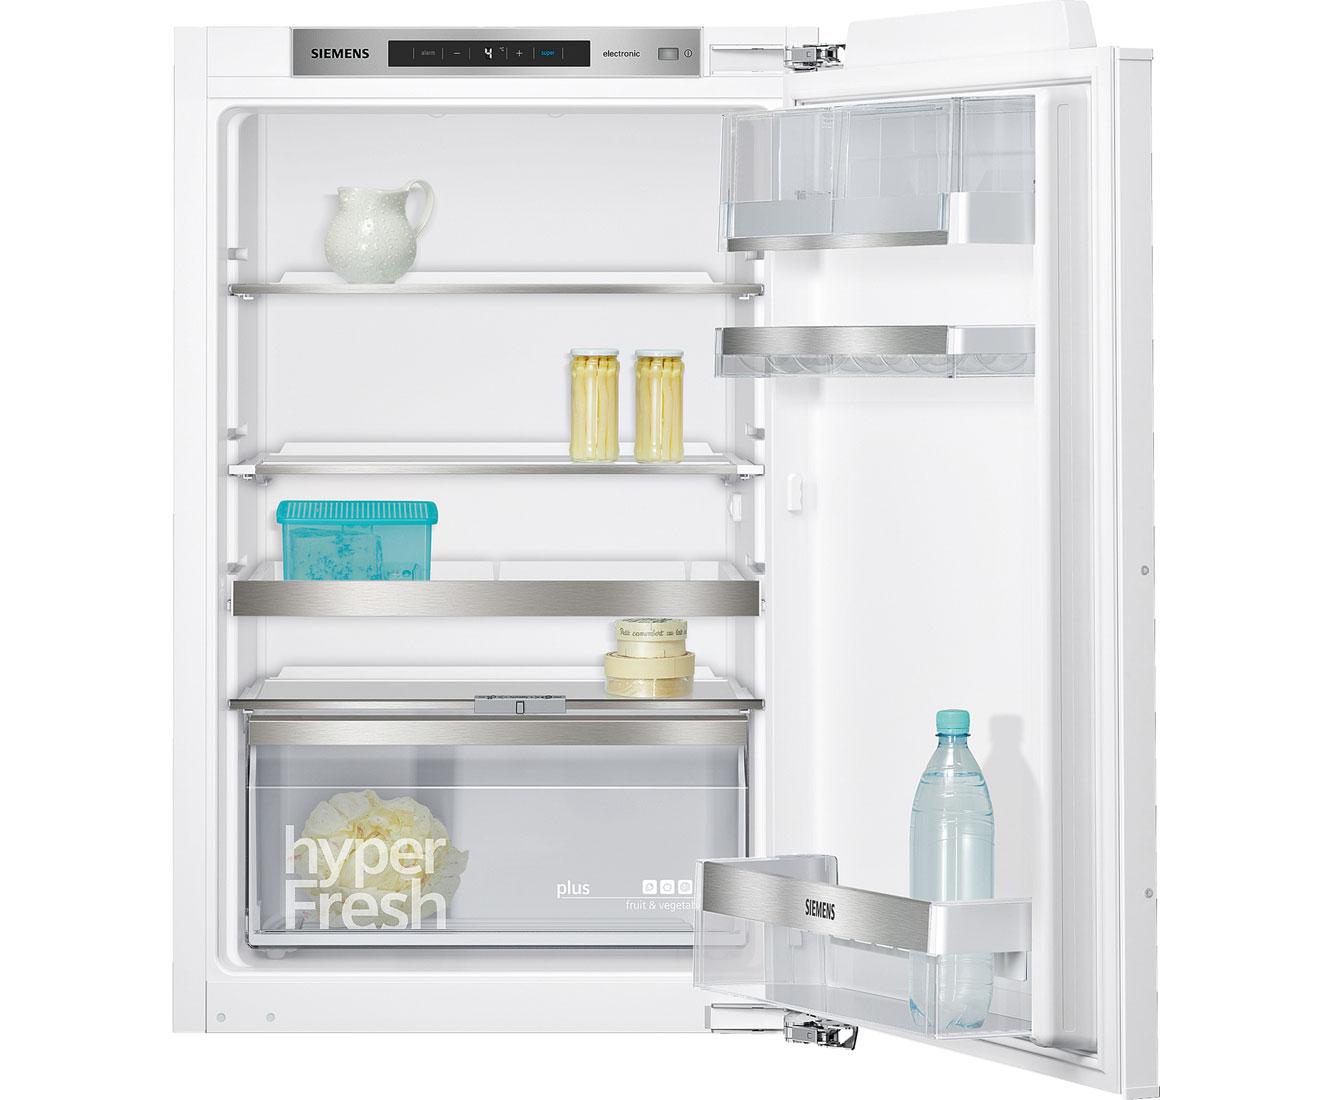 Siemens KI21RAD40 Kühlschränke - Weiß